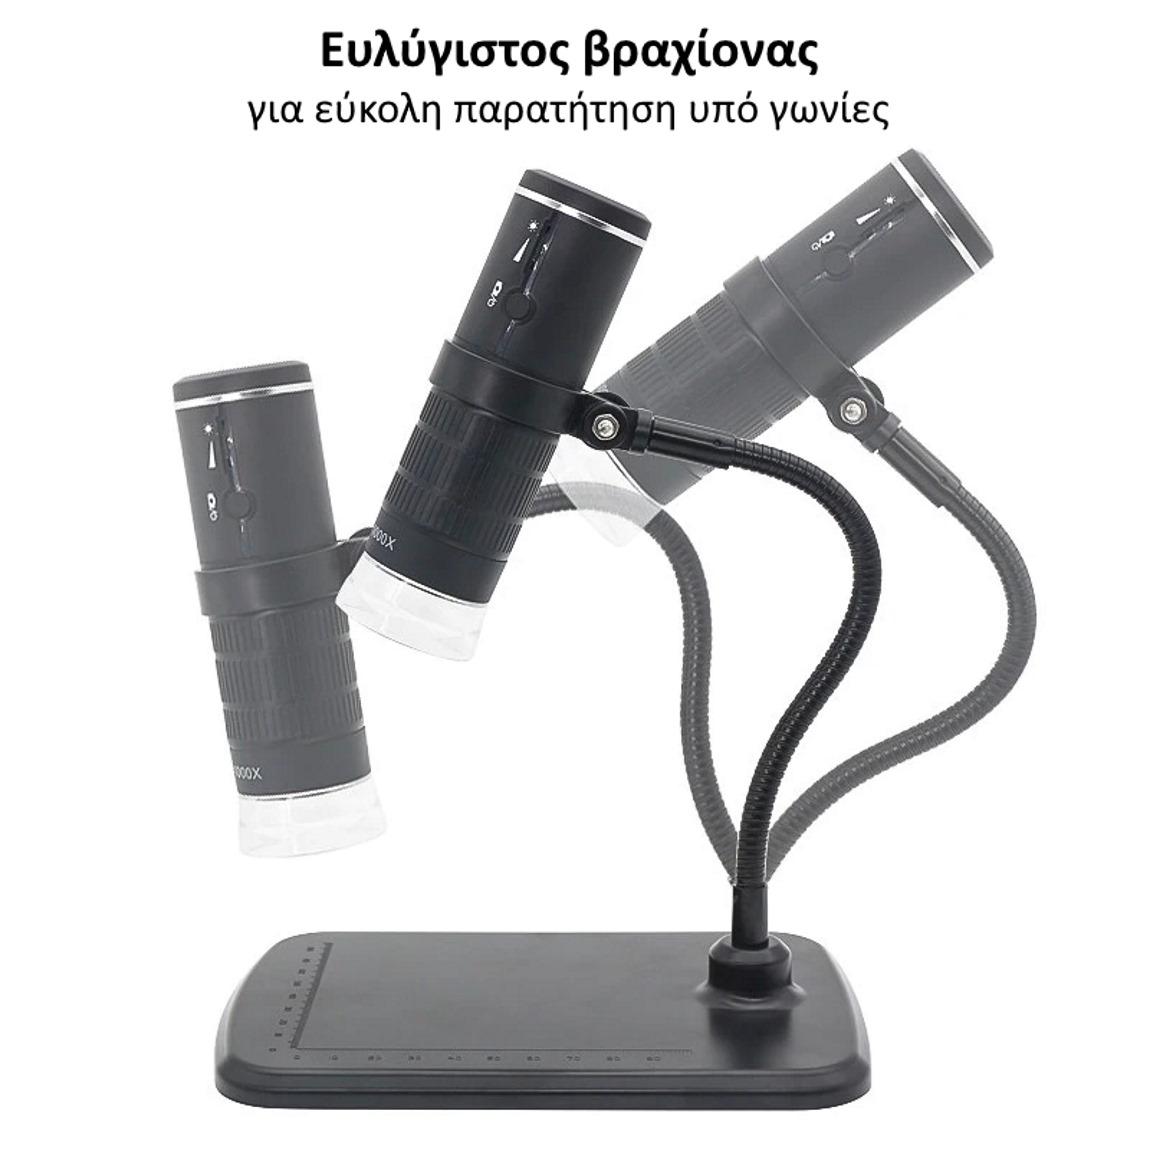 Eccomum ηλεκτρονικό μικροσκόπιο